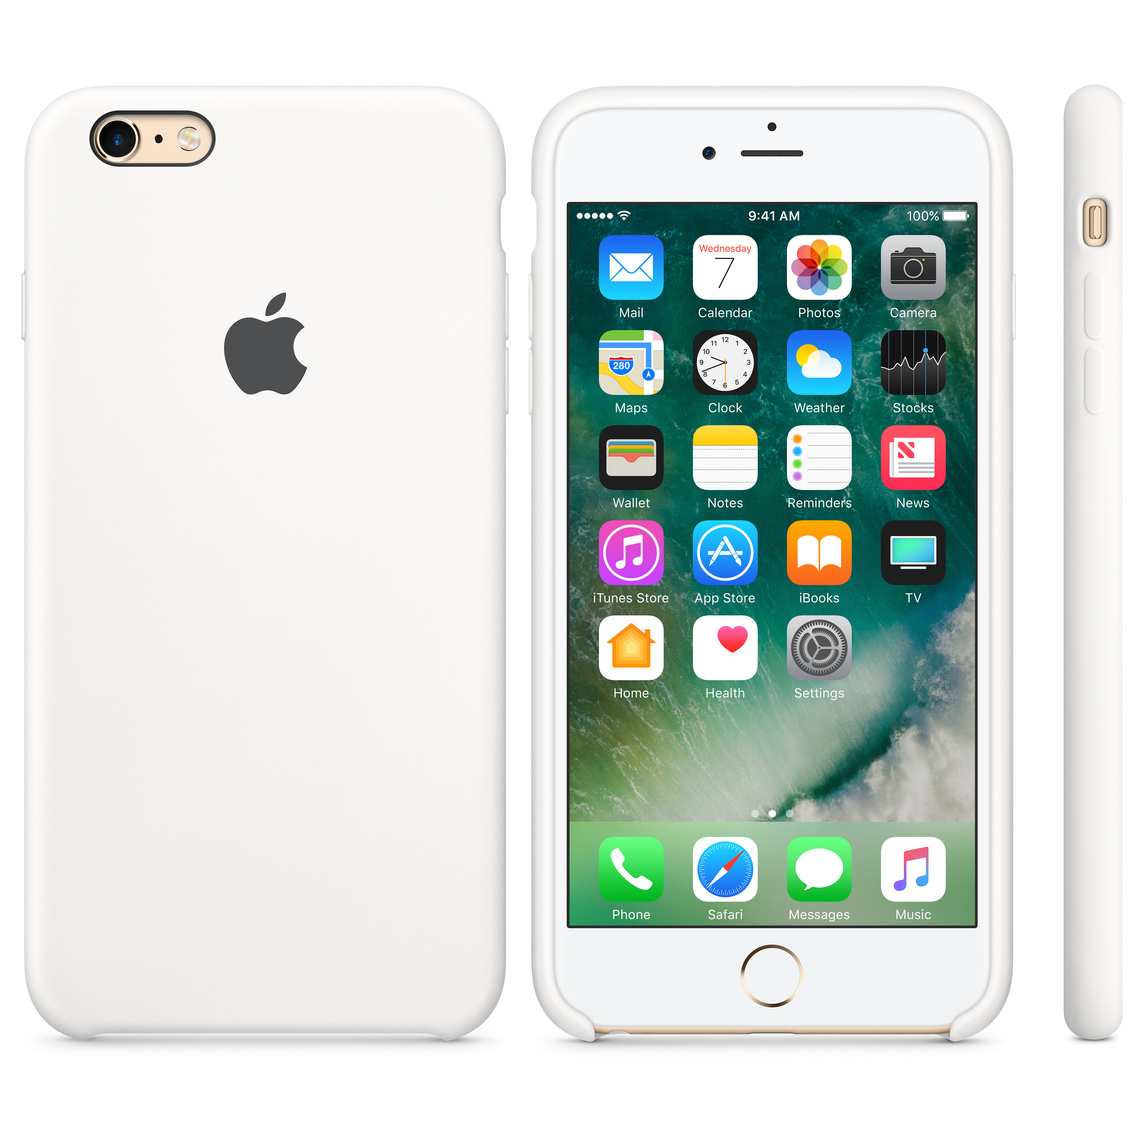 online retailer 5a2c0 e0835 iPhone 6 / 6s Silicone Case - White